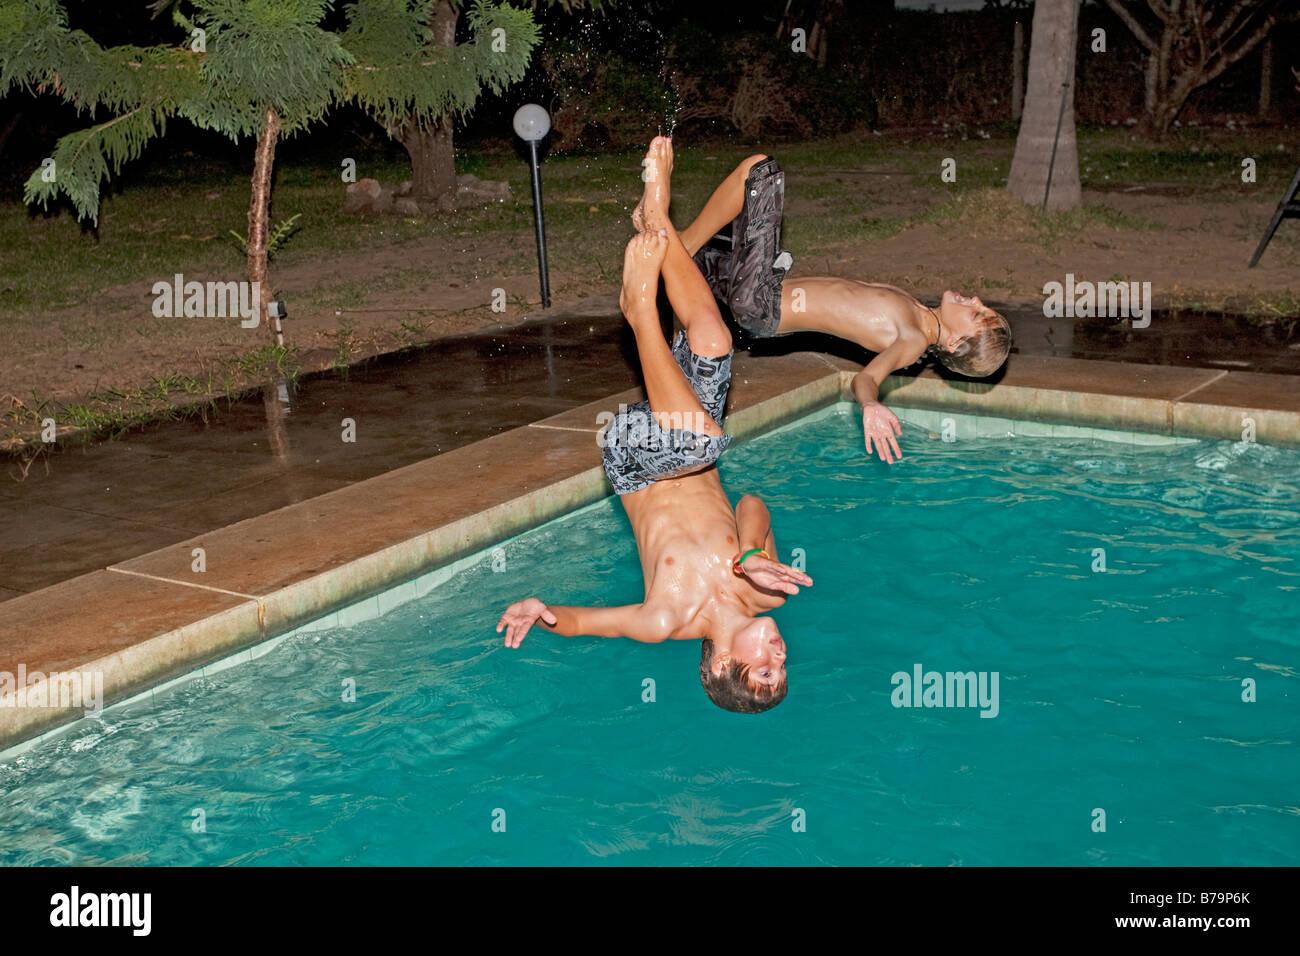 Two boys somersaulting into swimming pool Mombasa Kenya Stock Photo